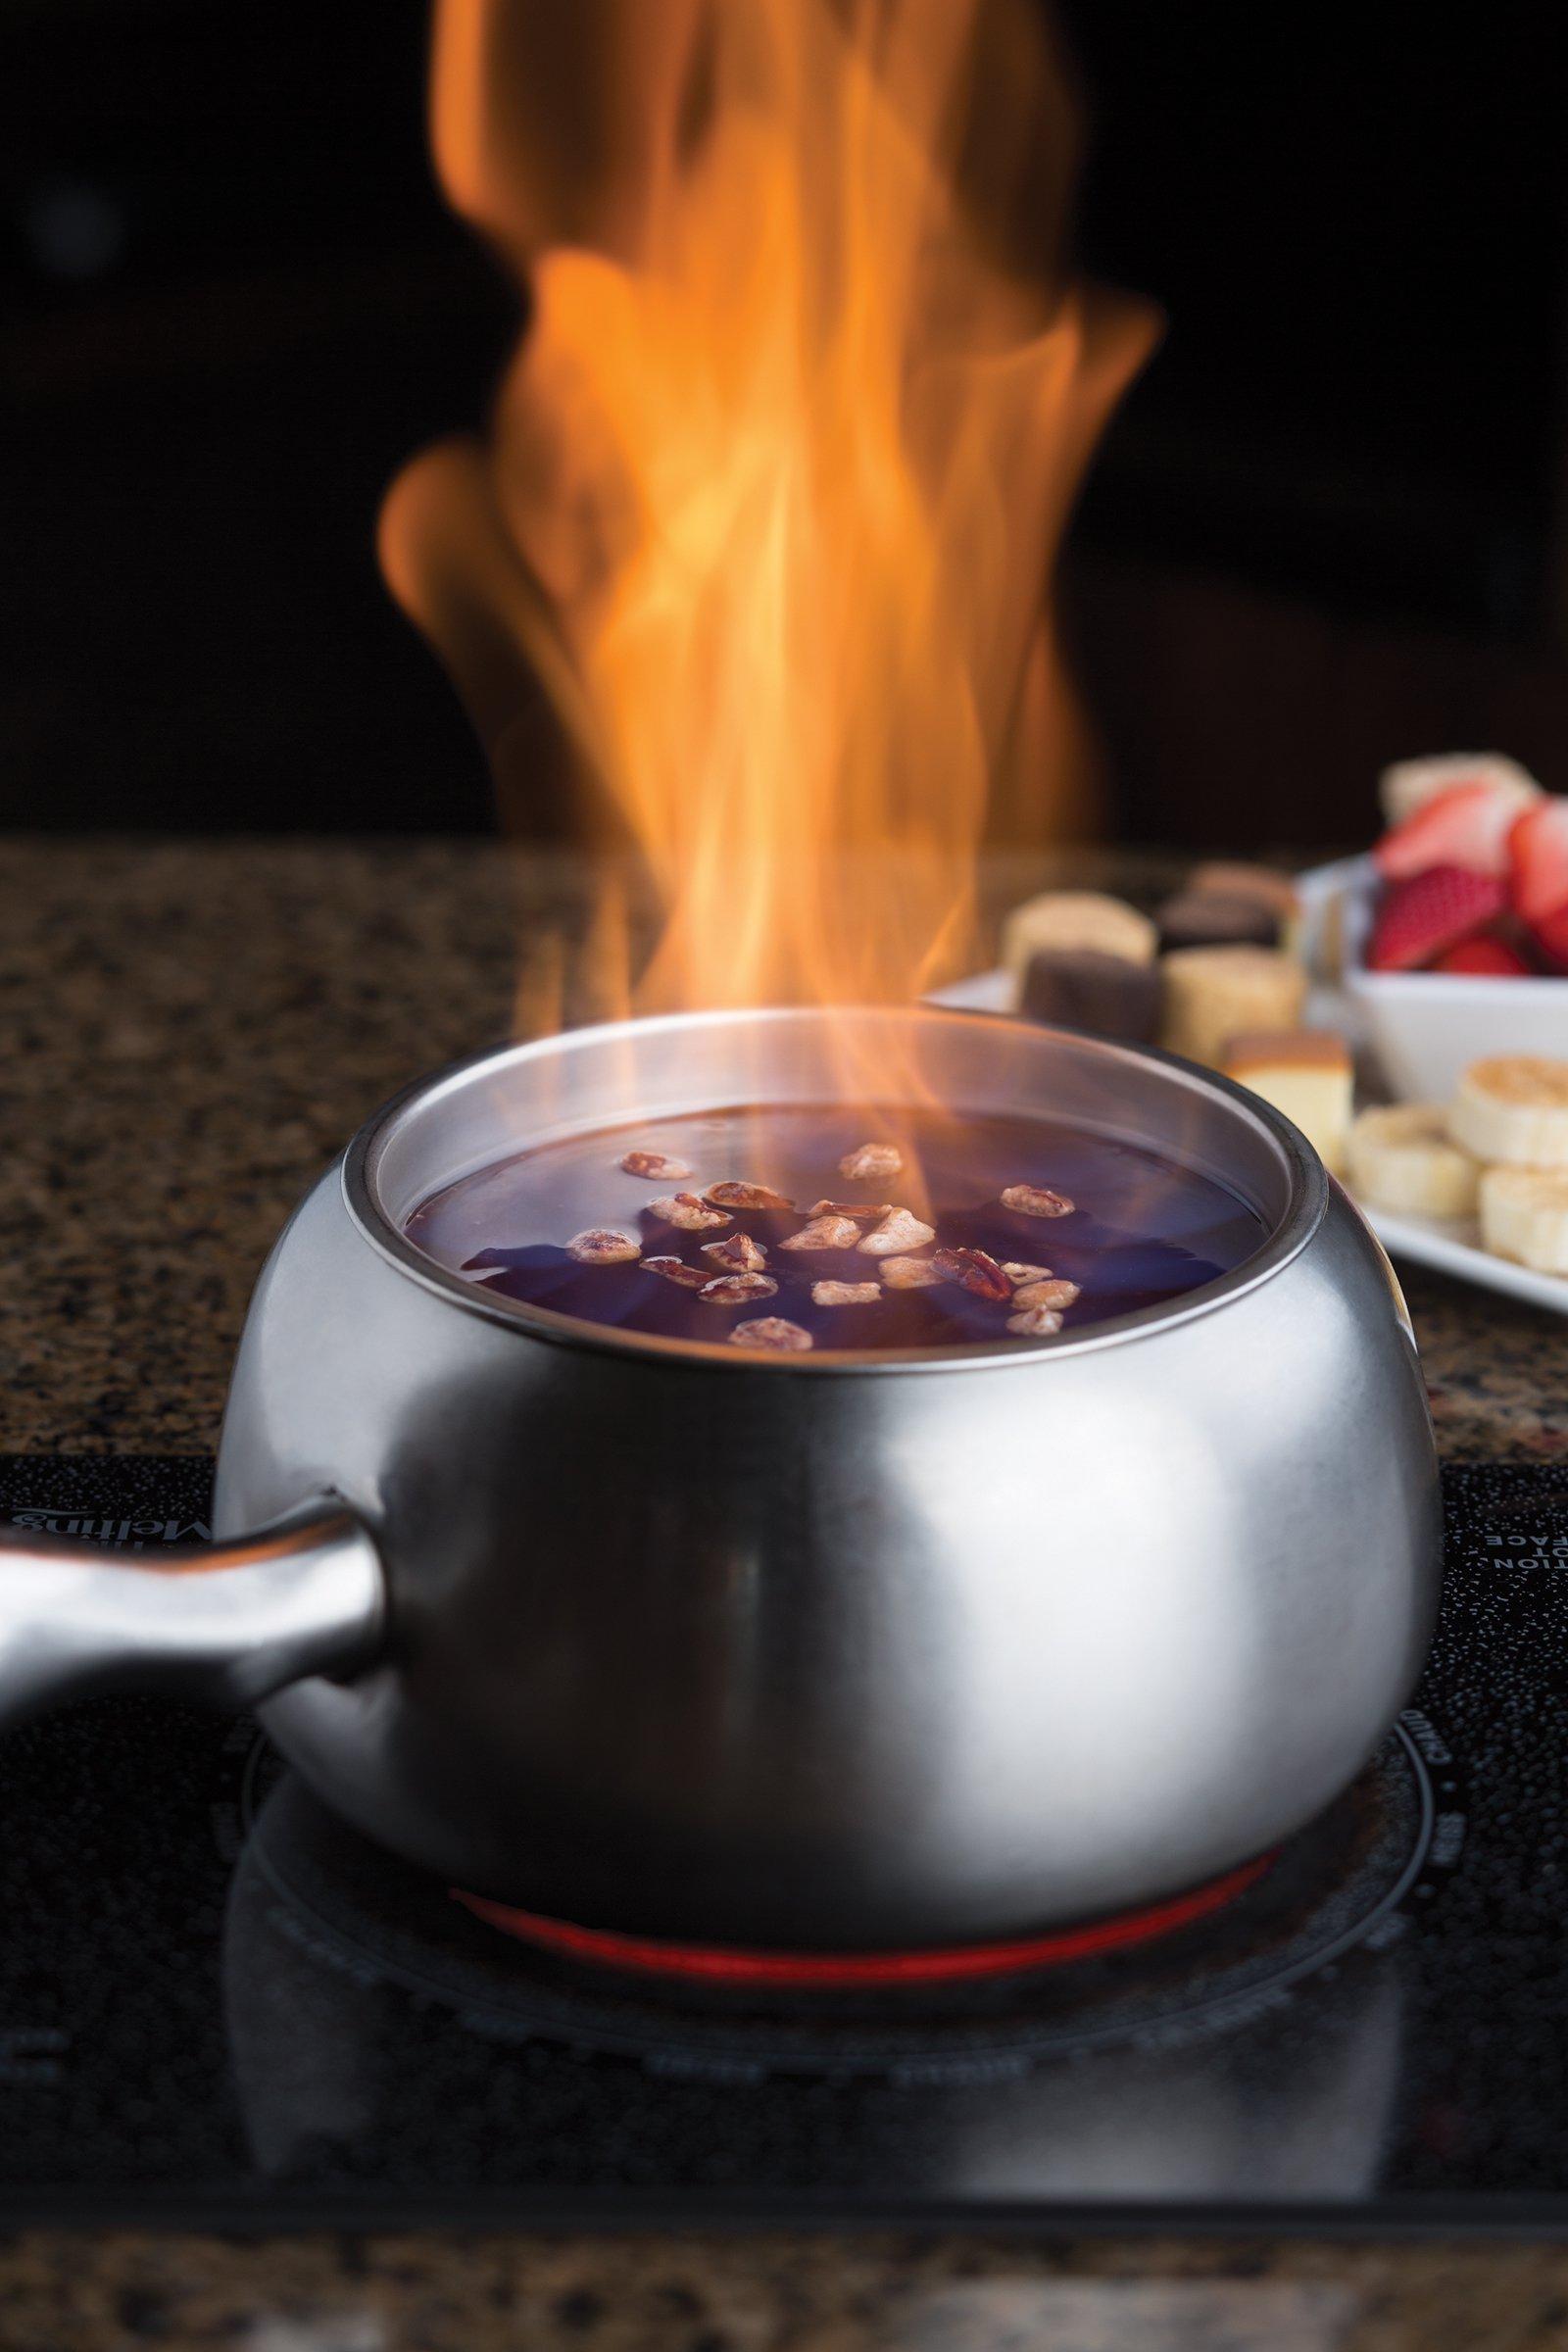 Melting Pot Myrtle Beach - Fine Fondue Restaurants in Myrtle Beach, SC